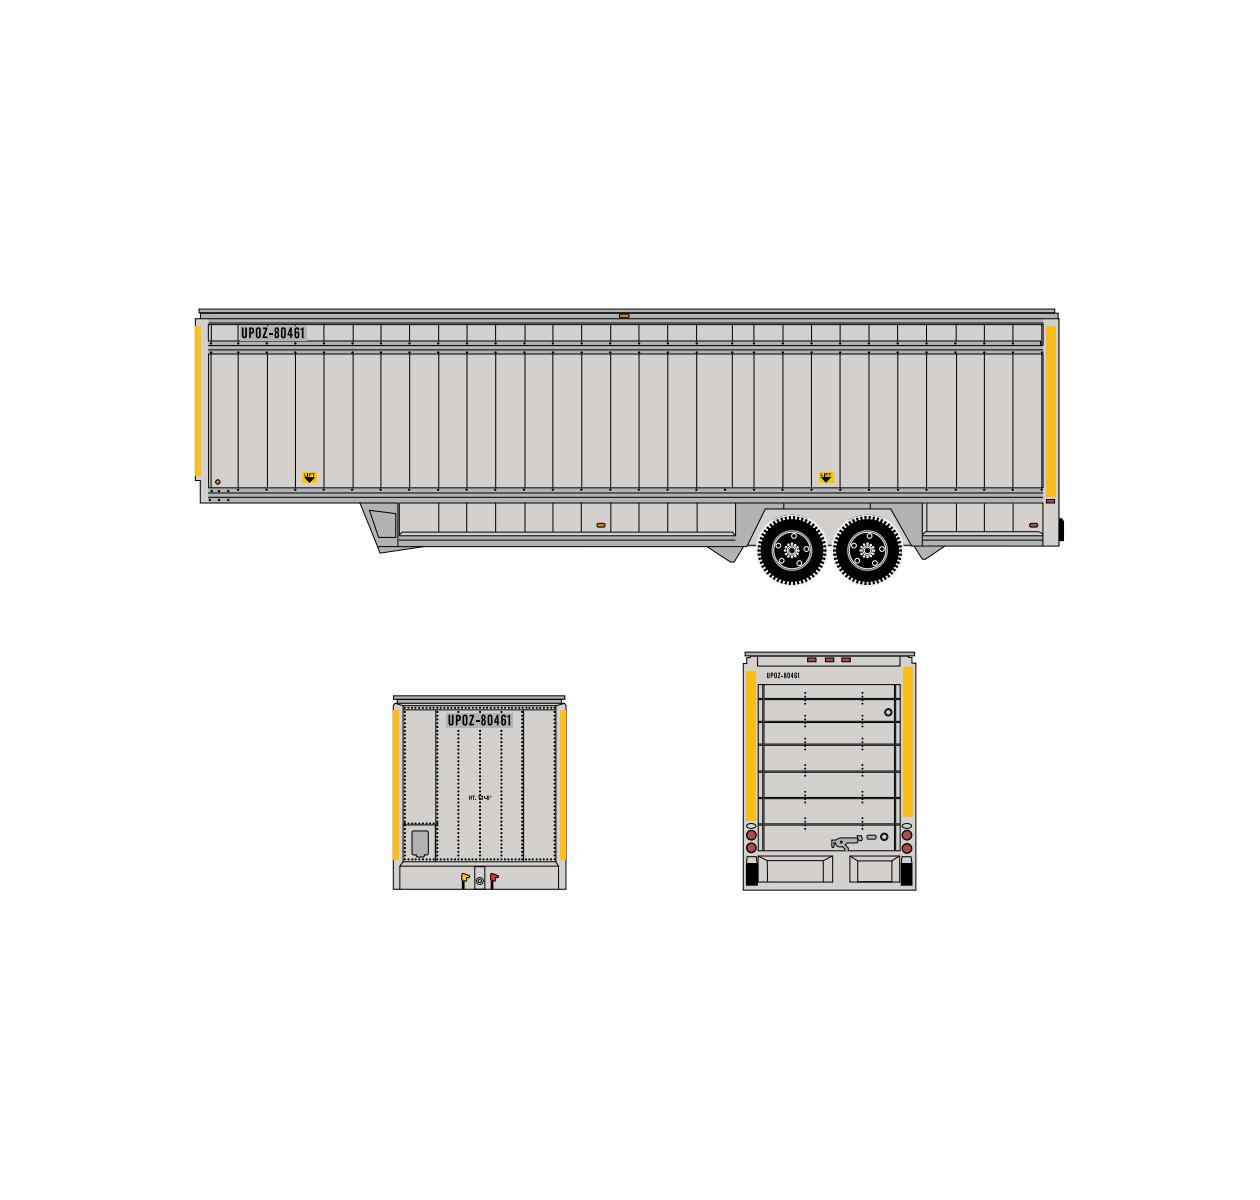 athearn_n_40'_ups_trailer_yellow_stripes